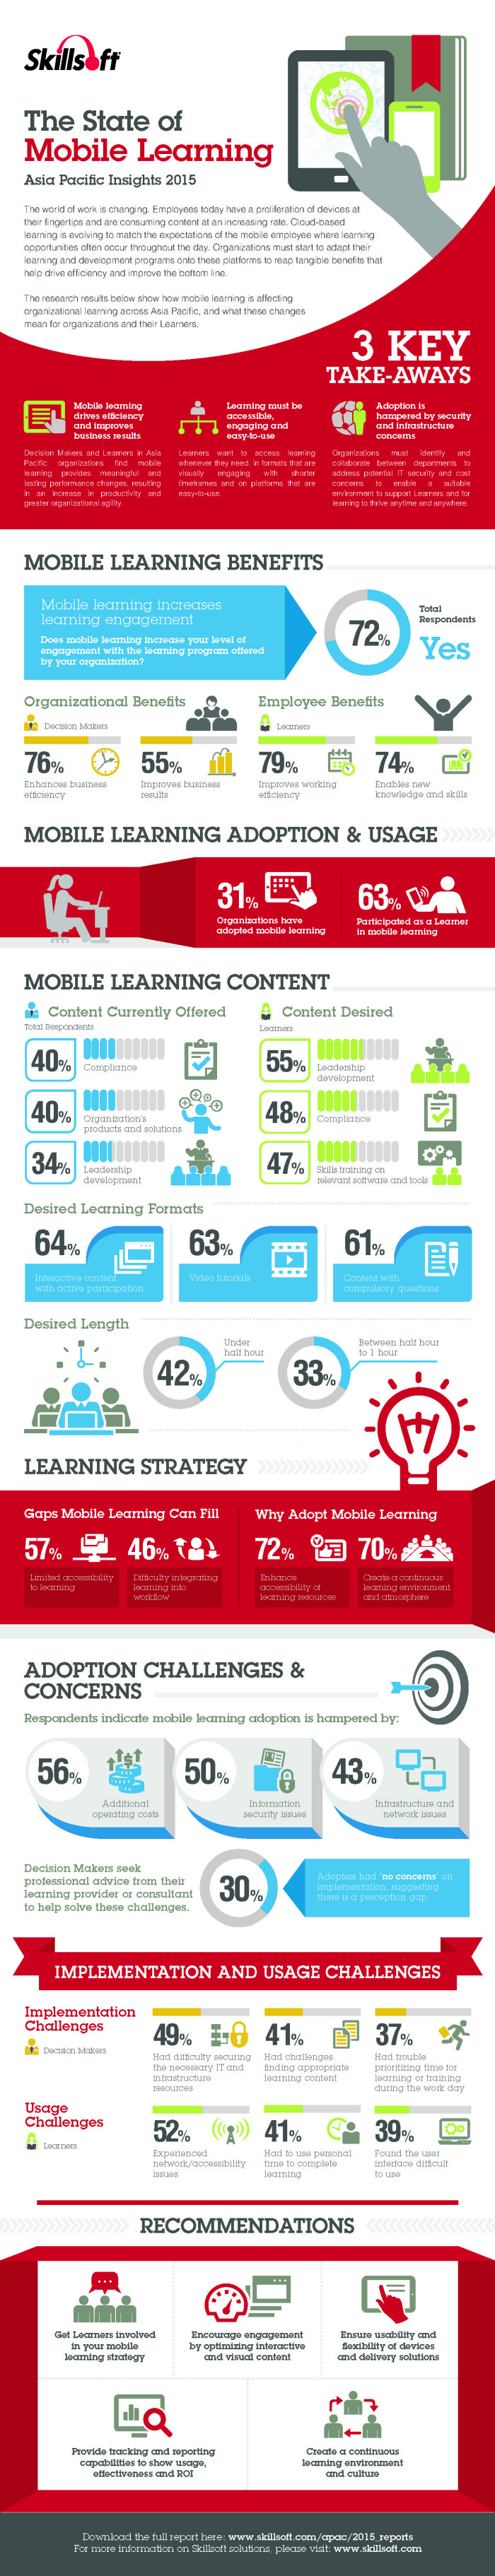 skillsoft infographic